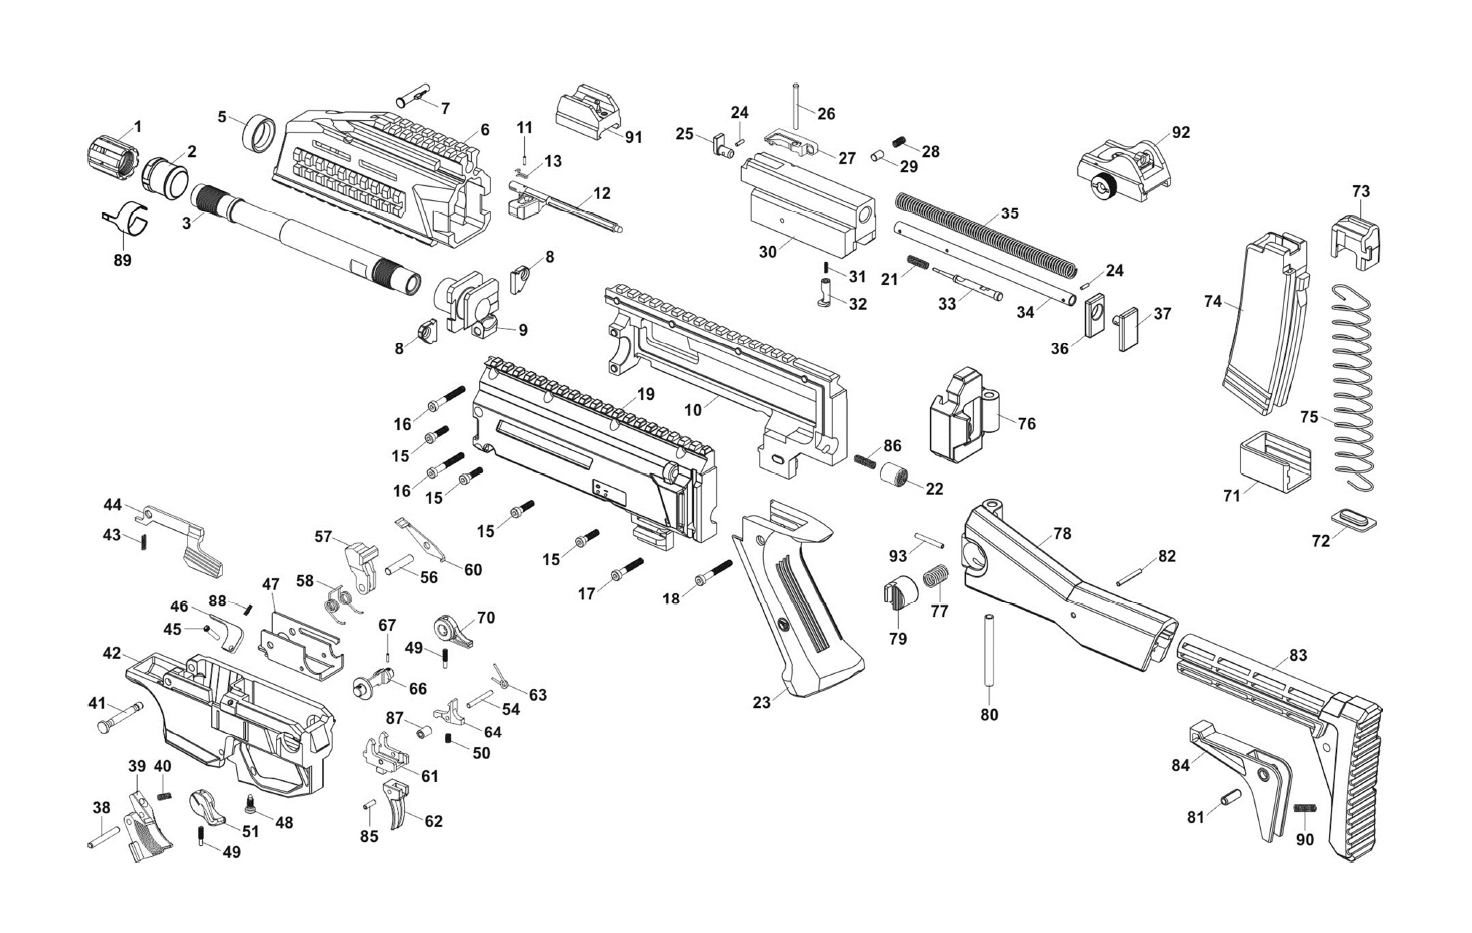 Cz Scorpion Evo 3 S1 Parts Diagram